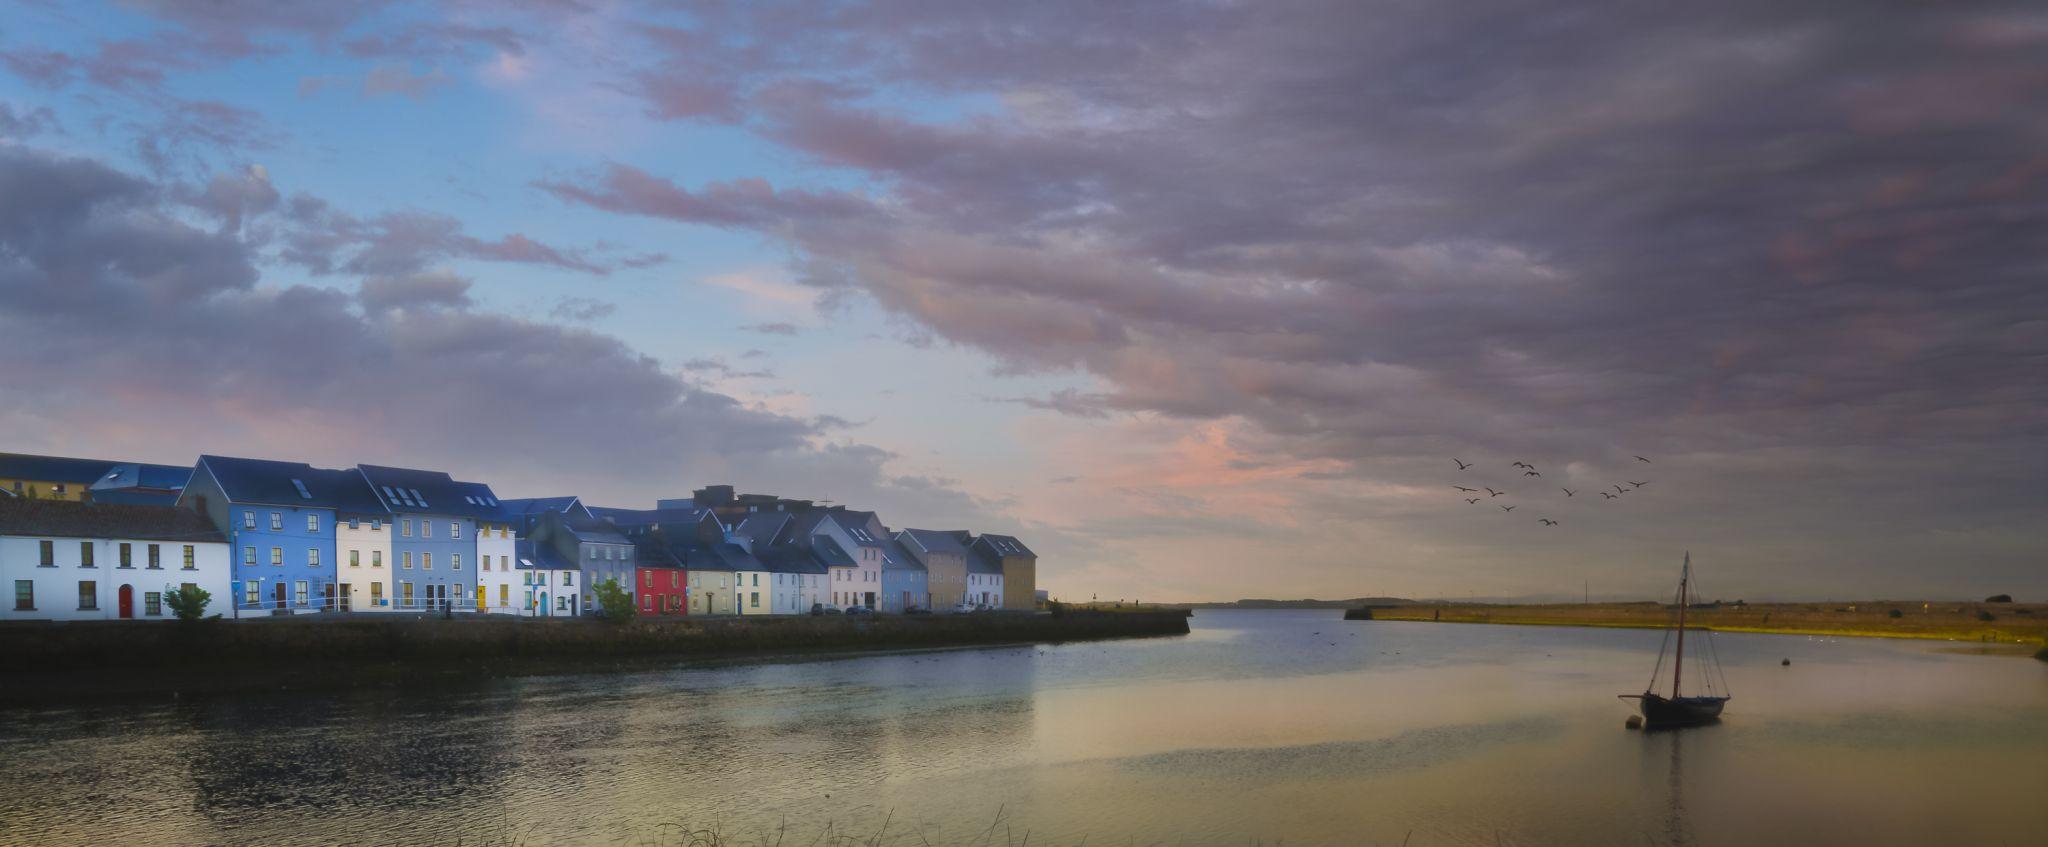 Galway Bay, Ireland, Ireland